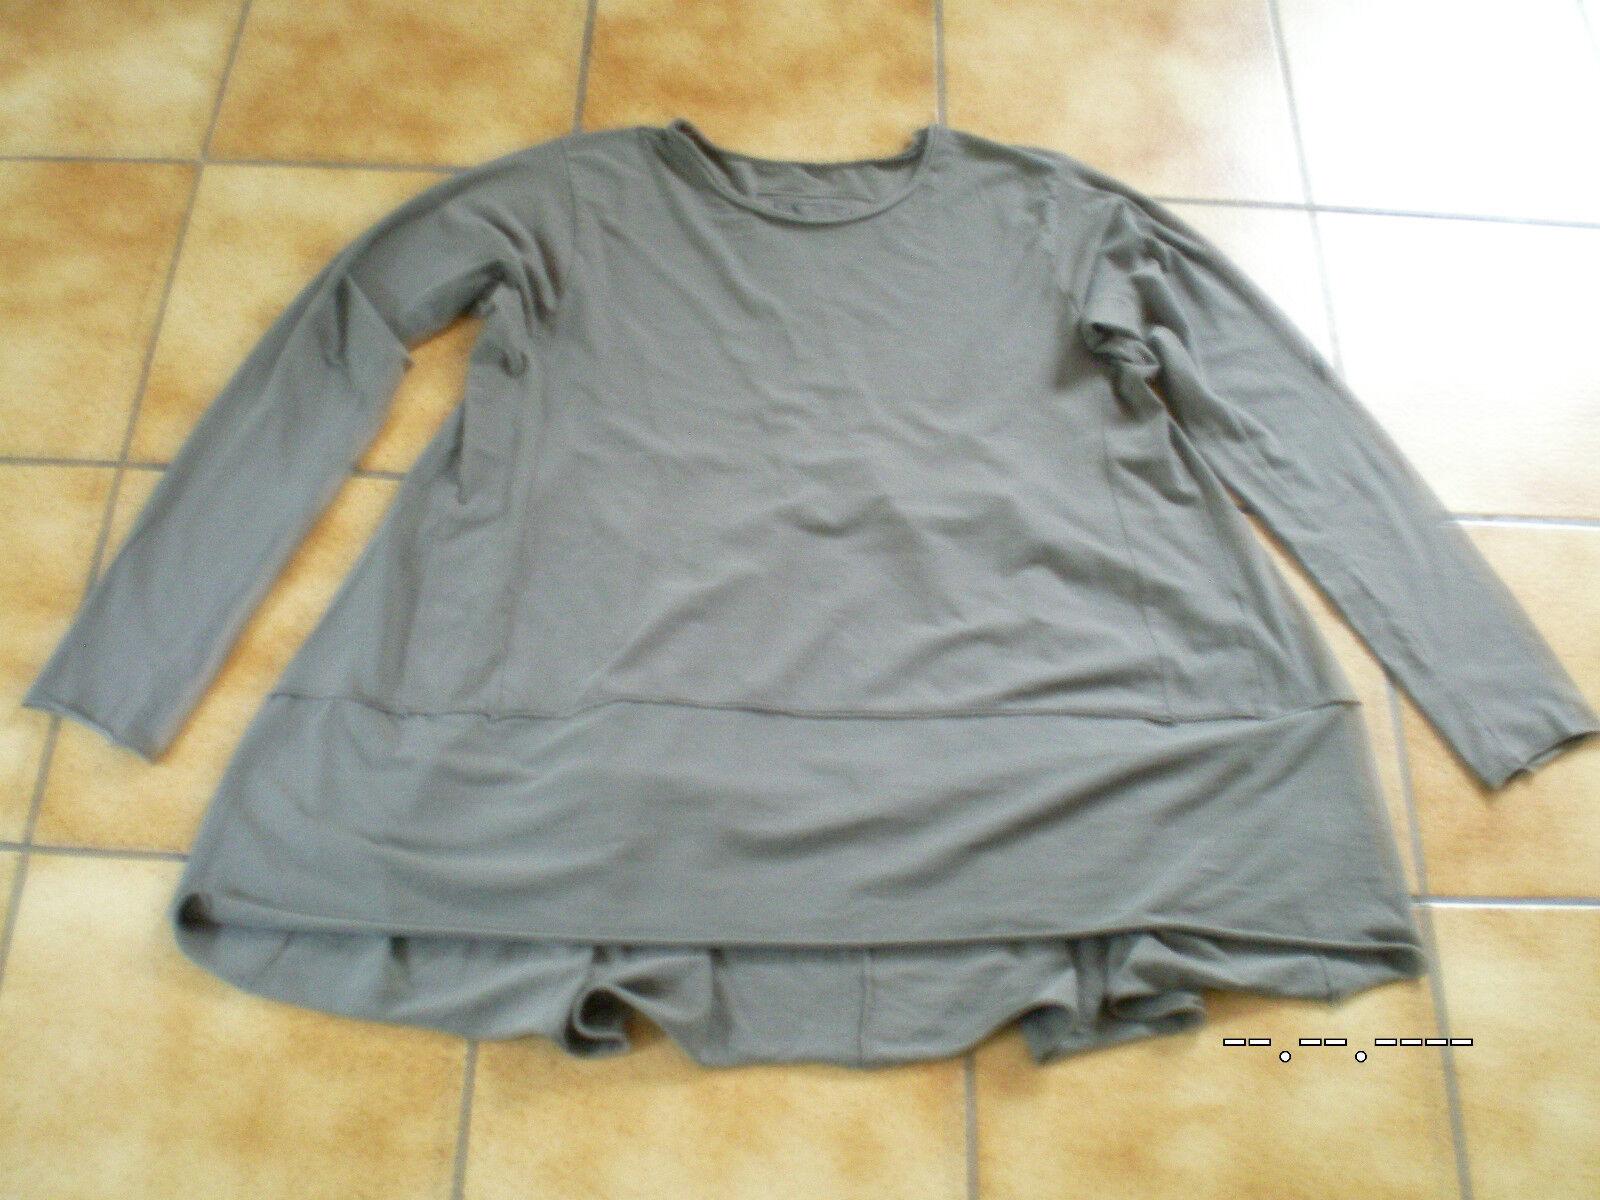 Rundholz schwarz Label,Shirttunika Tunika Shirt,lang,zinc,Gr.L(OS),Lagenlook